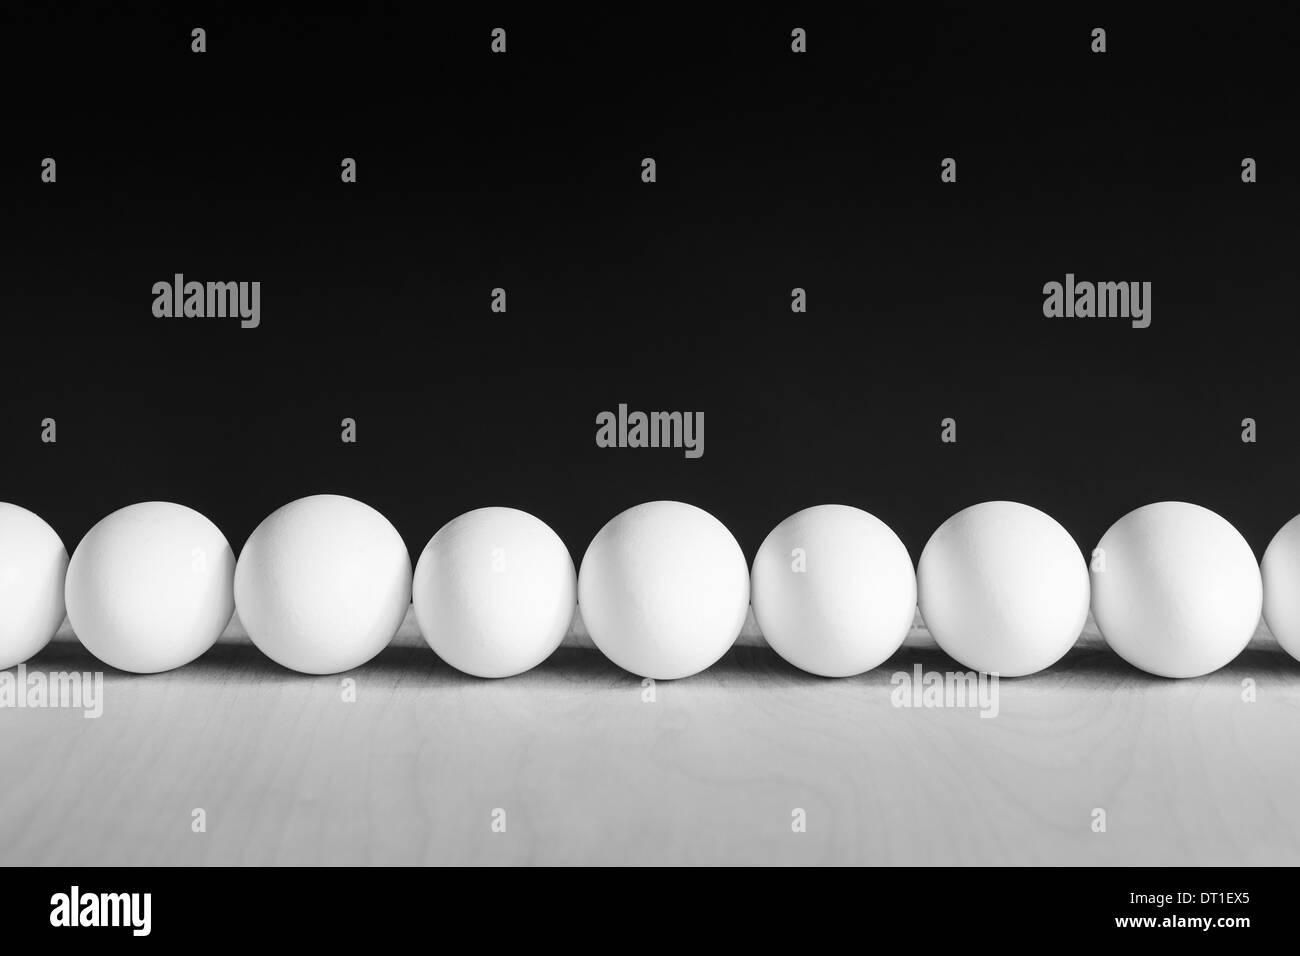 Row of white free range organic eggs black background - Stock Image